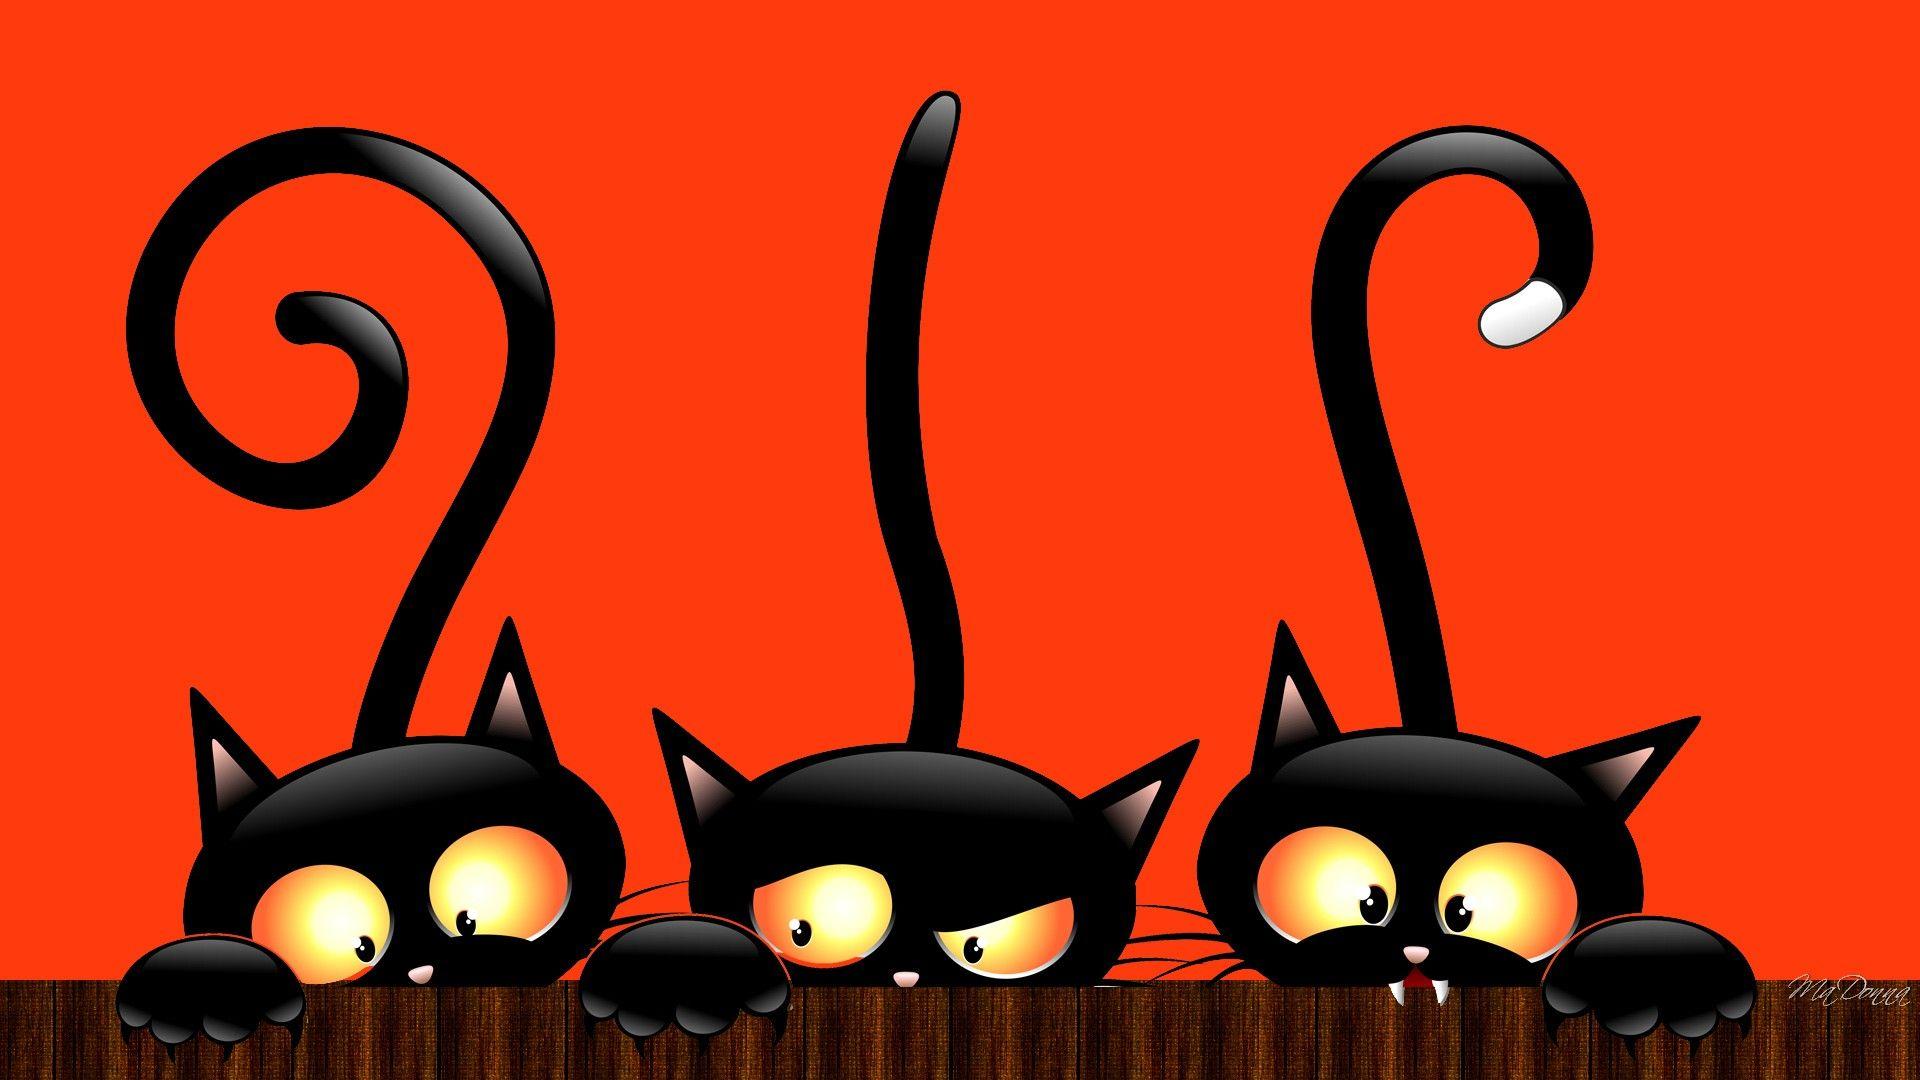 Desktop Hd Wallpaper Halloween Original Size Cat Wallpaper Halloween Cat Whimsical Halloween